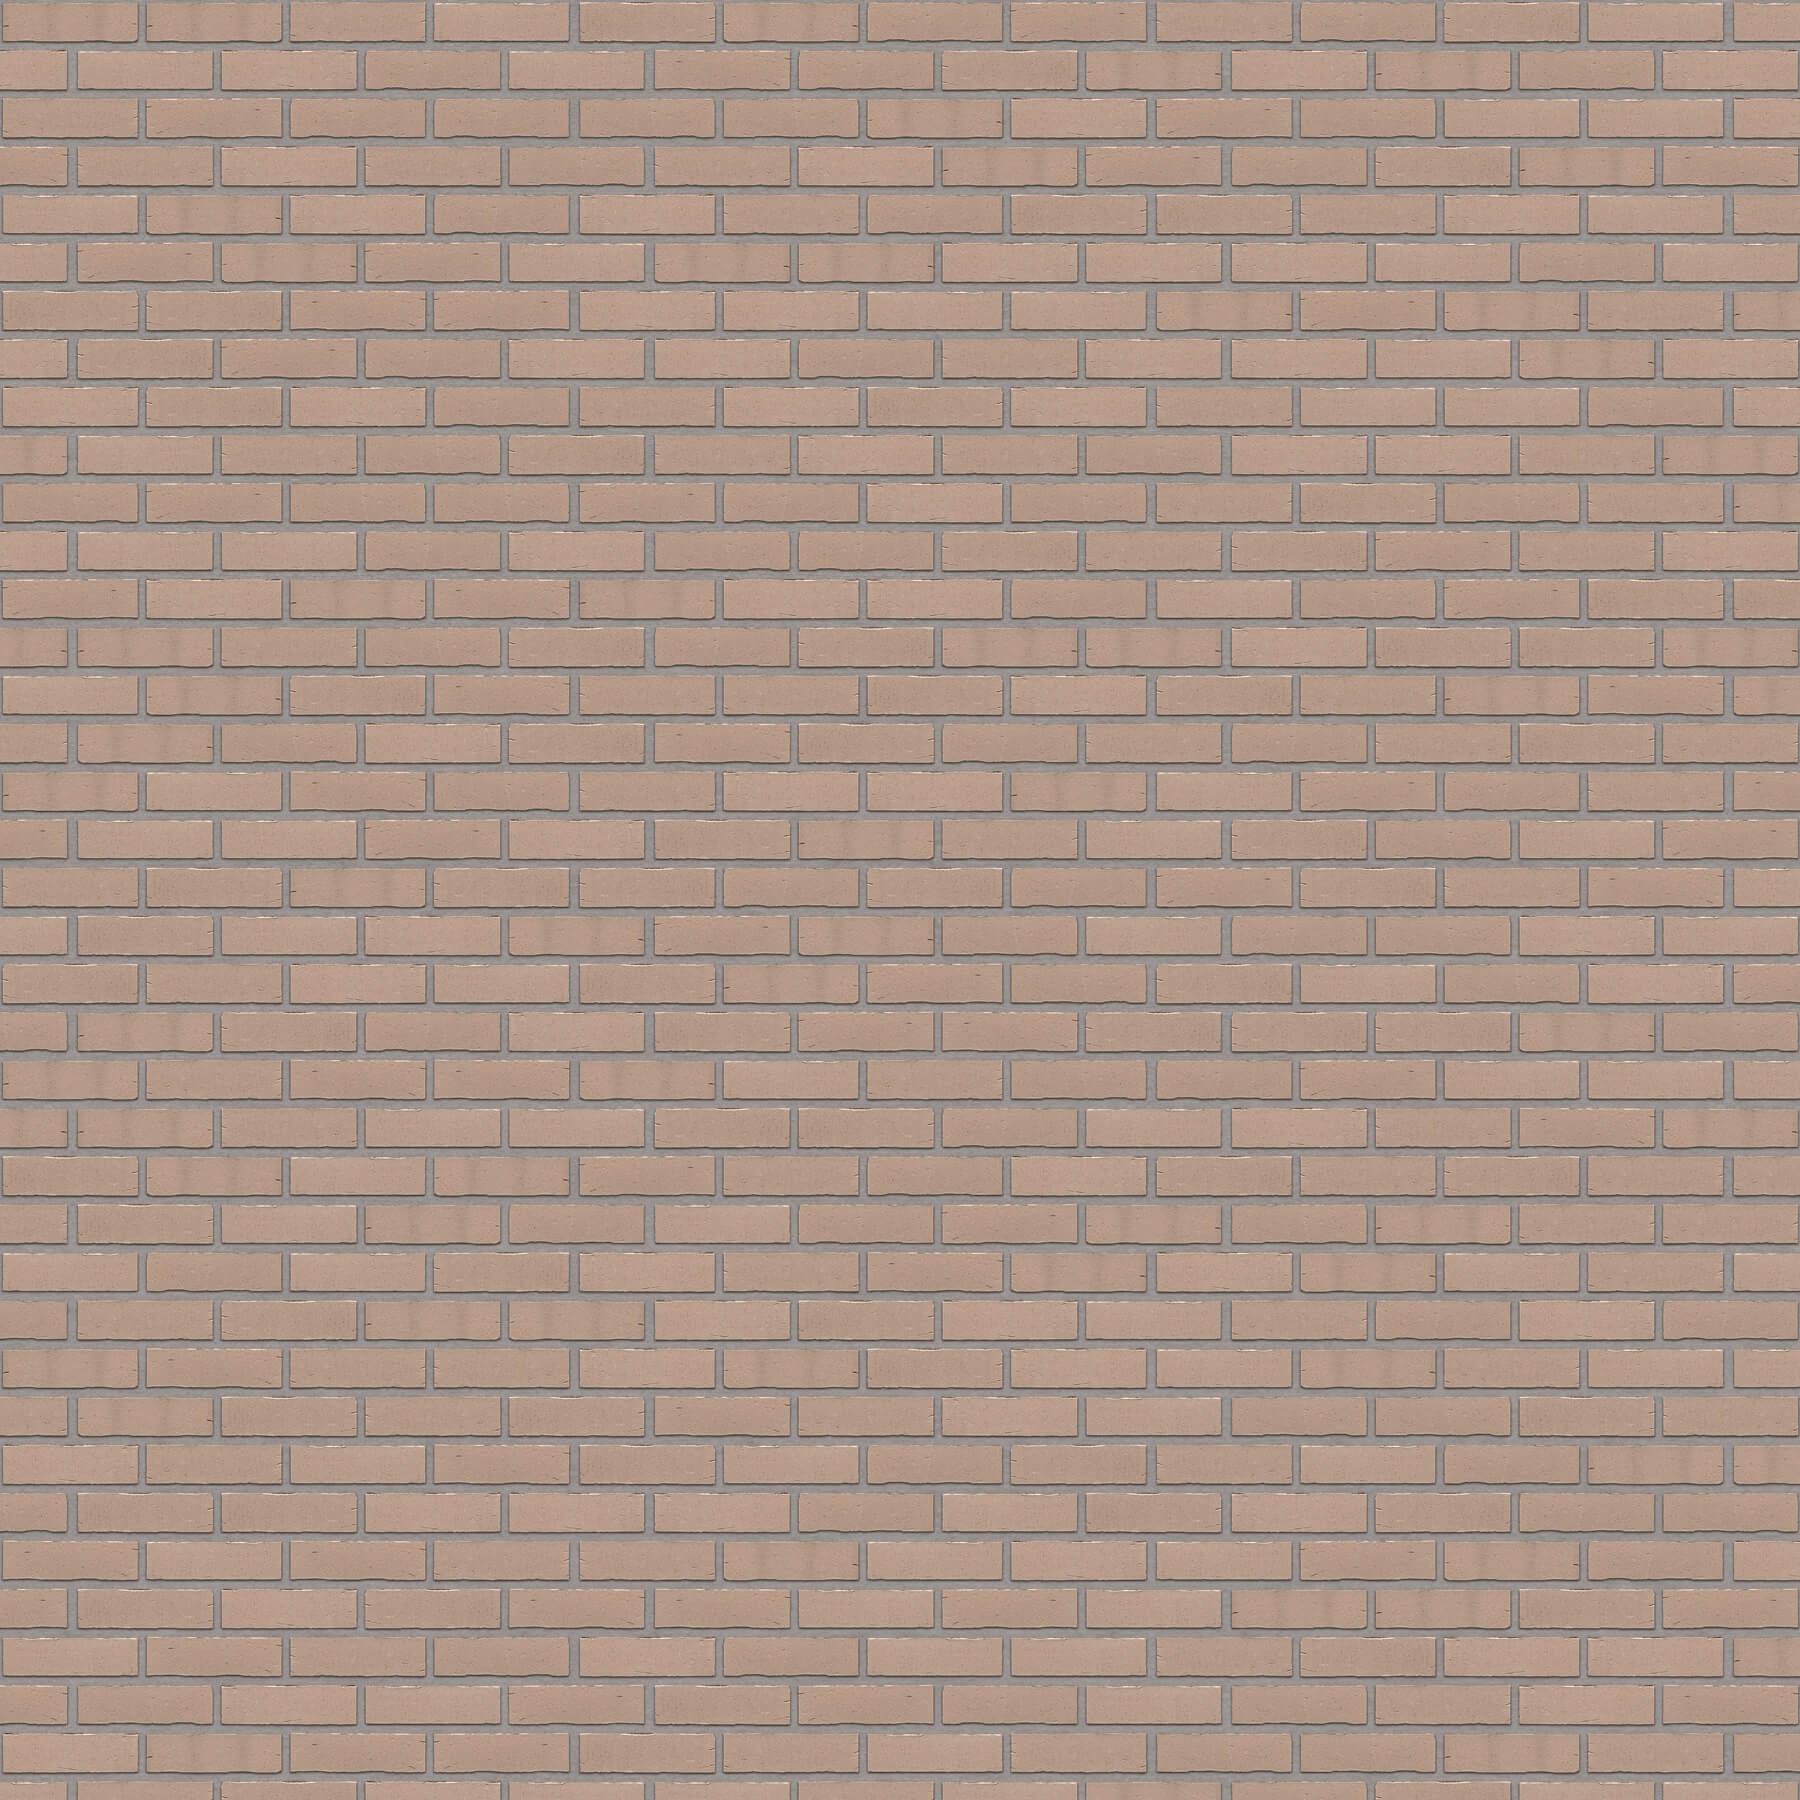 Dekorativna cigla listela FeldHaus Klinker r-760 nf Siva